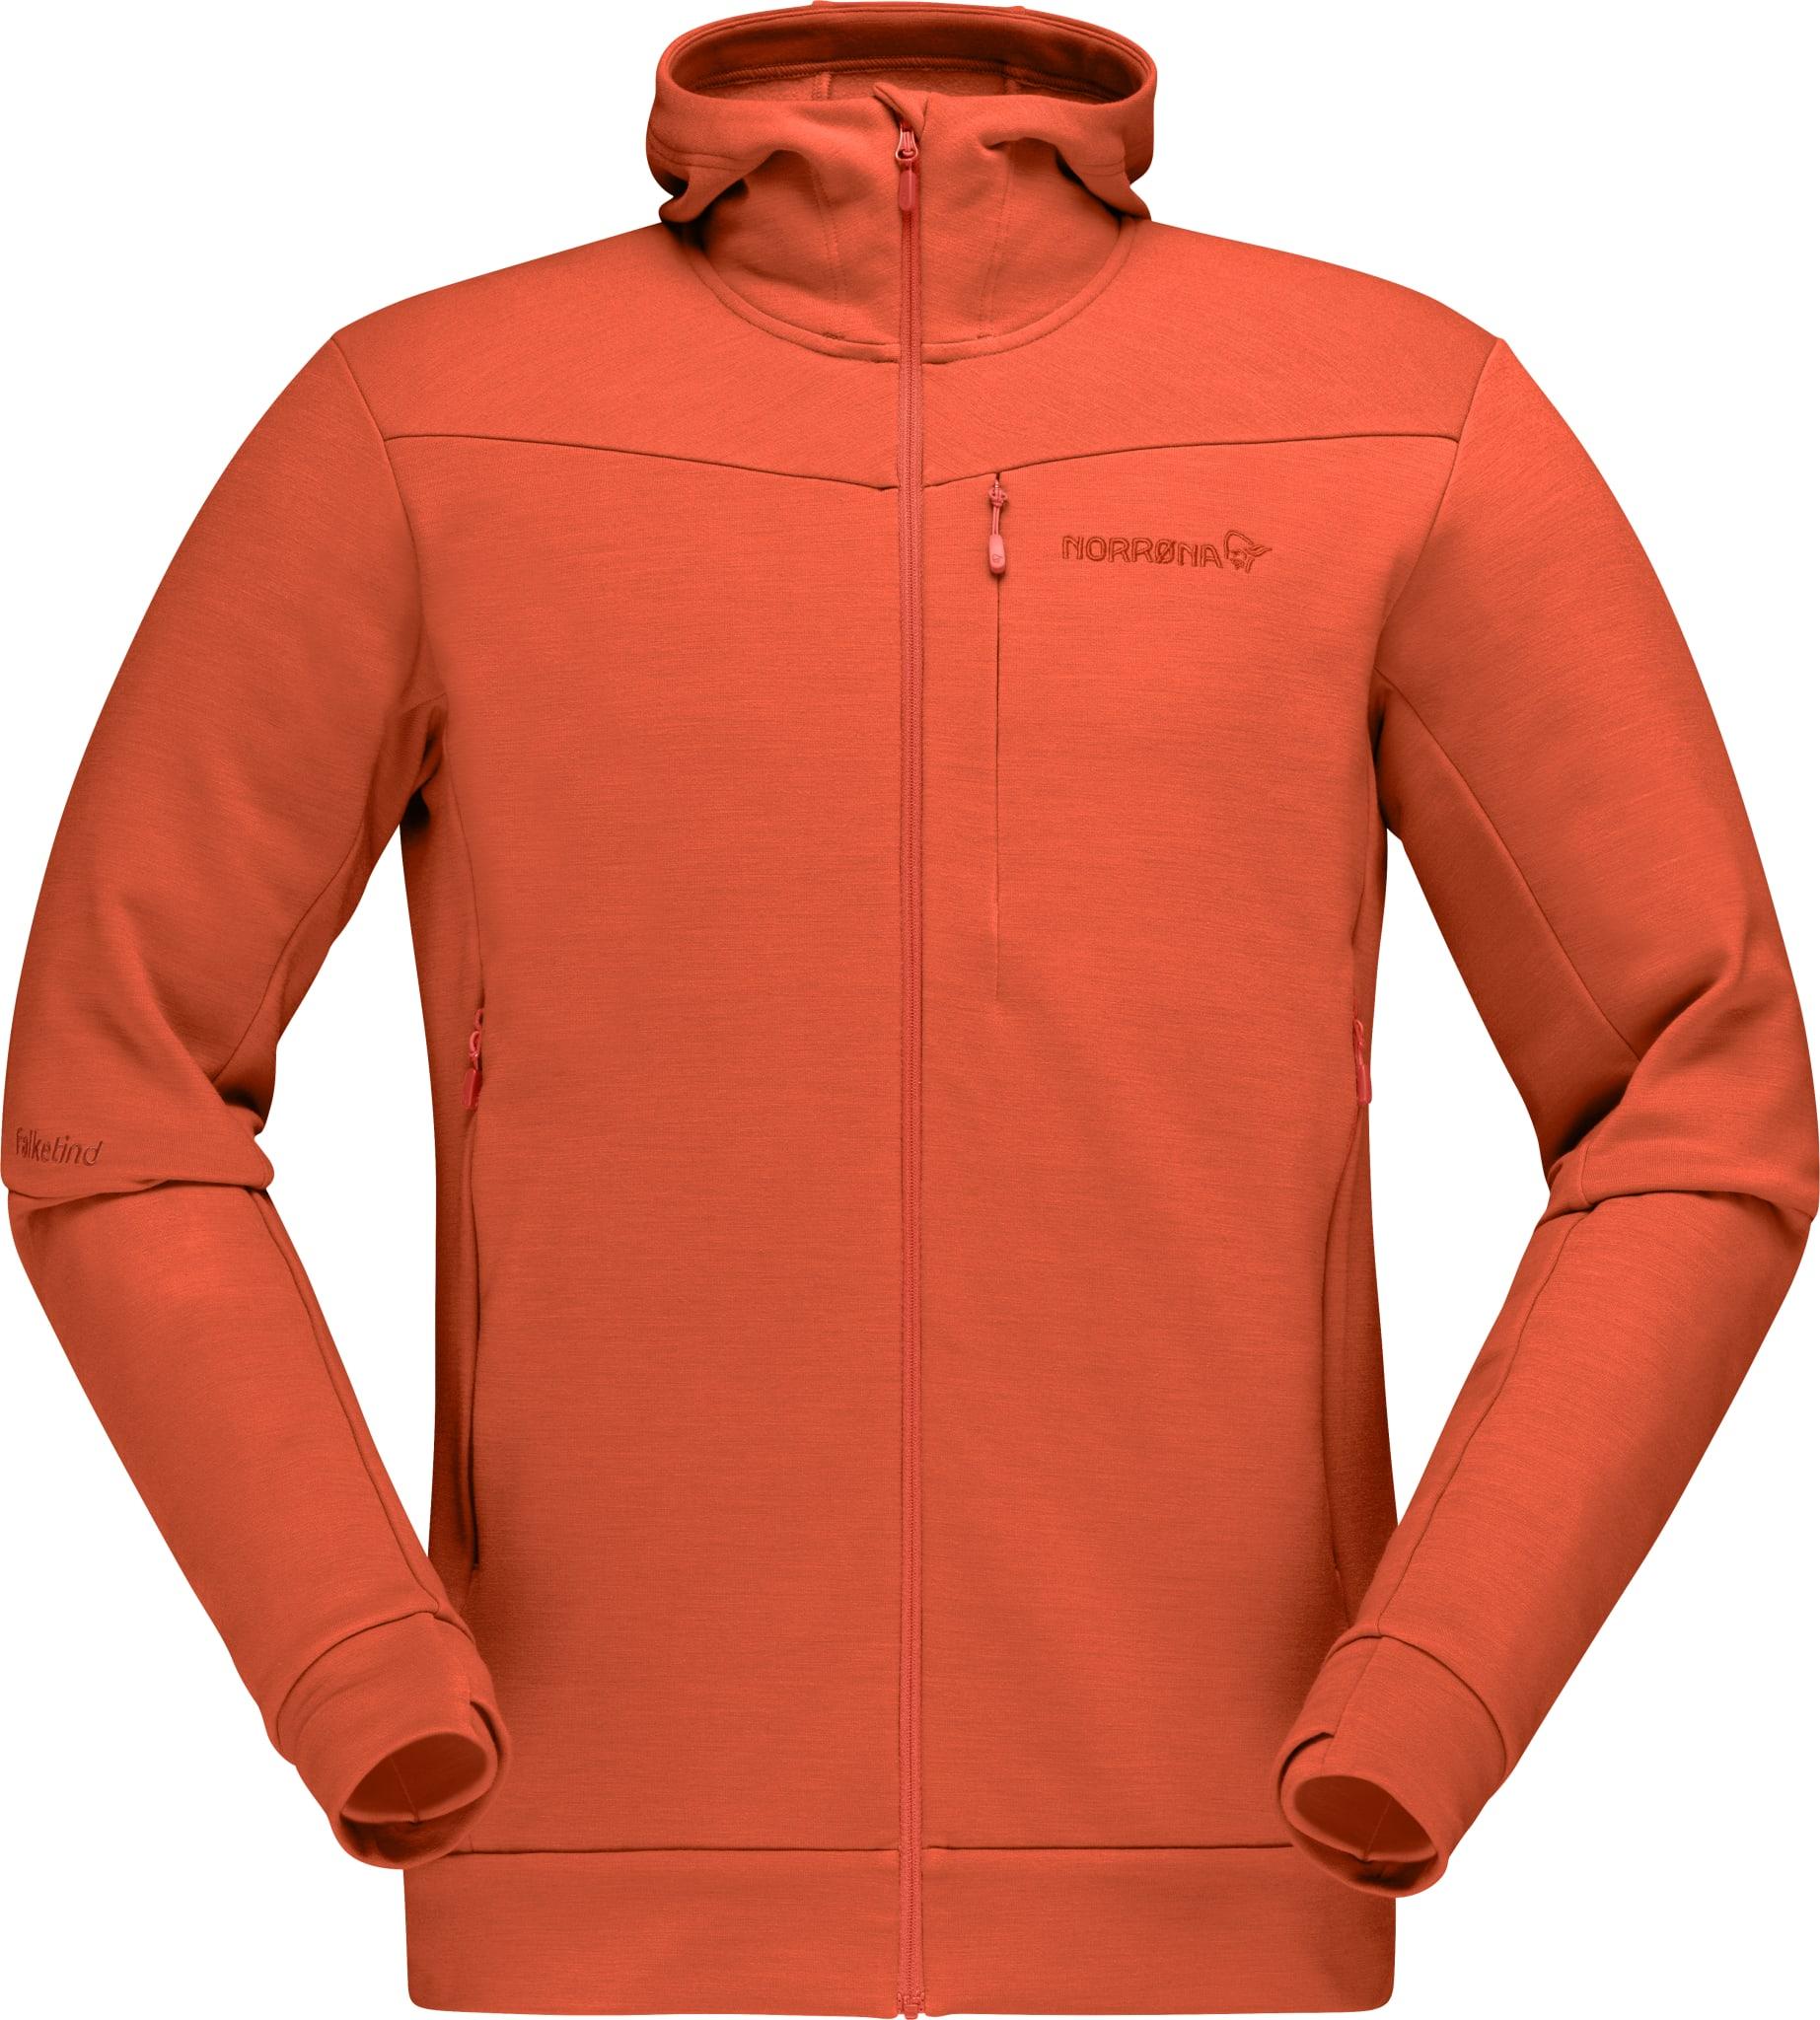 Falketind warmwool2 stretch Zip Hood